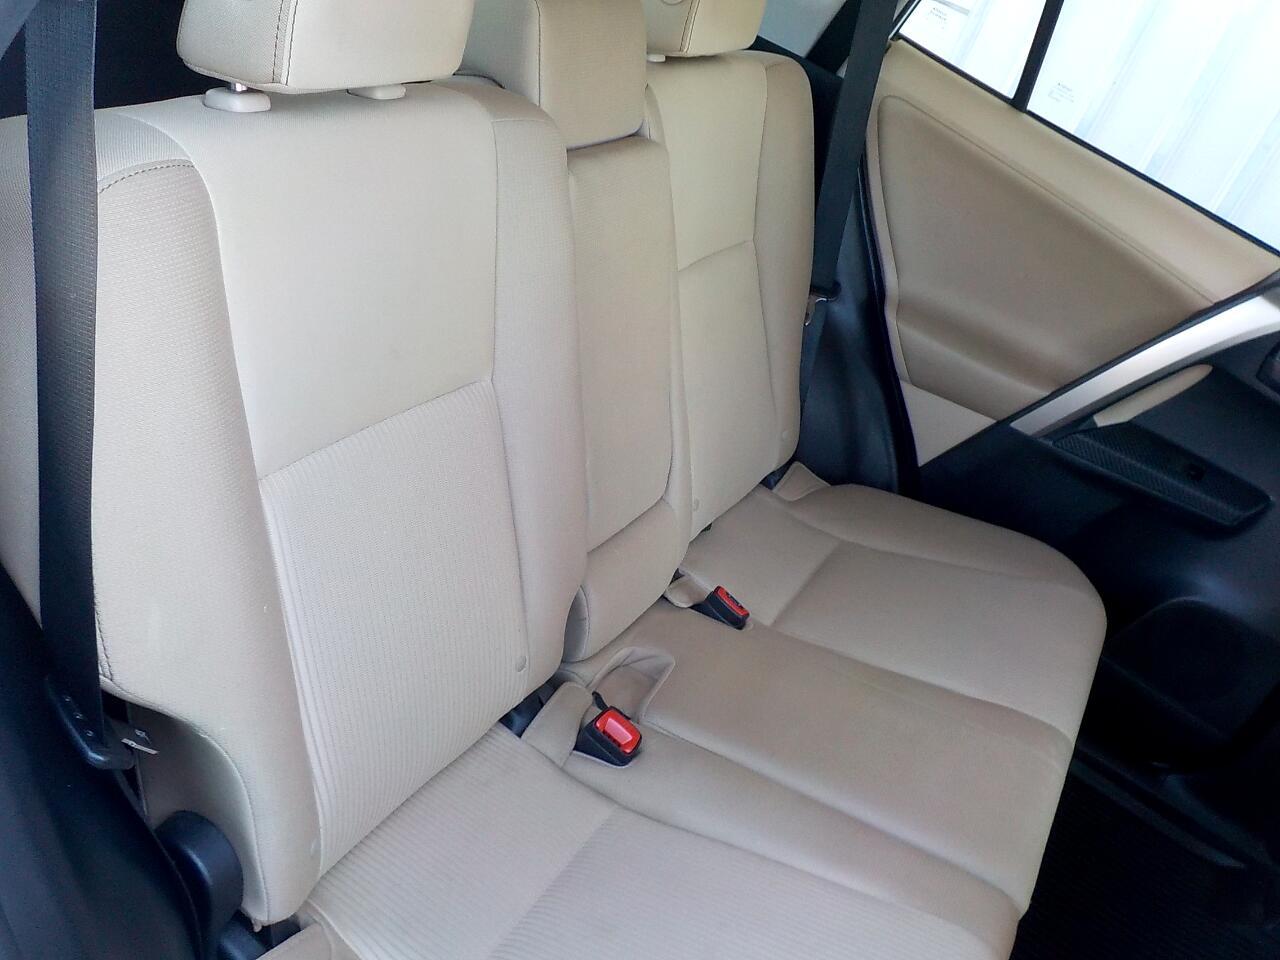 2013 Toyota RAV4 AWD 4dr XLE (Natl)